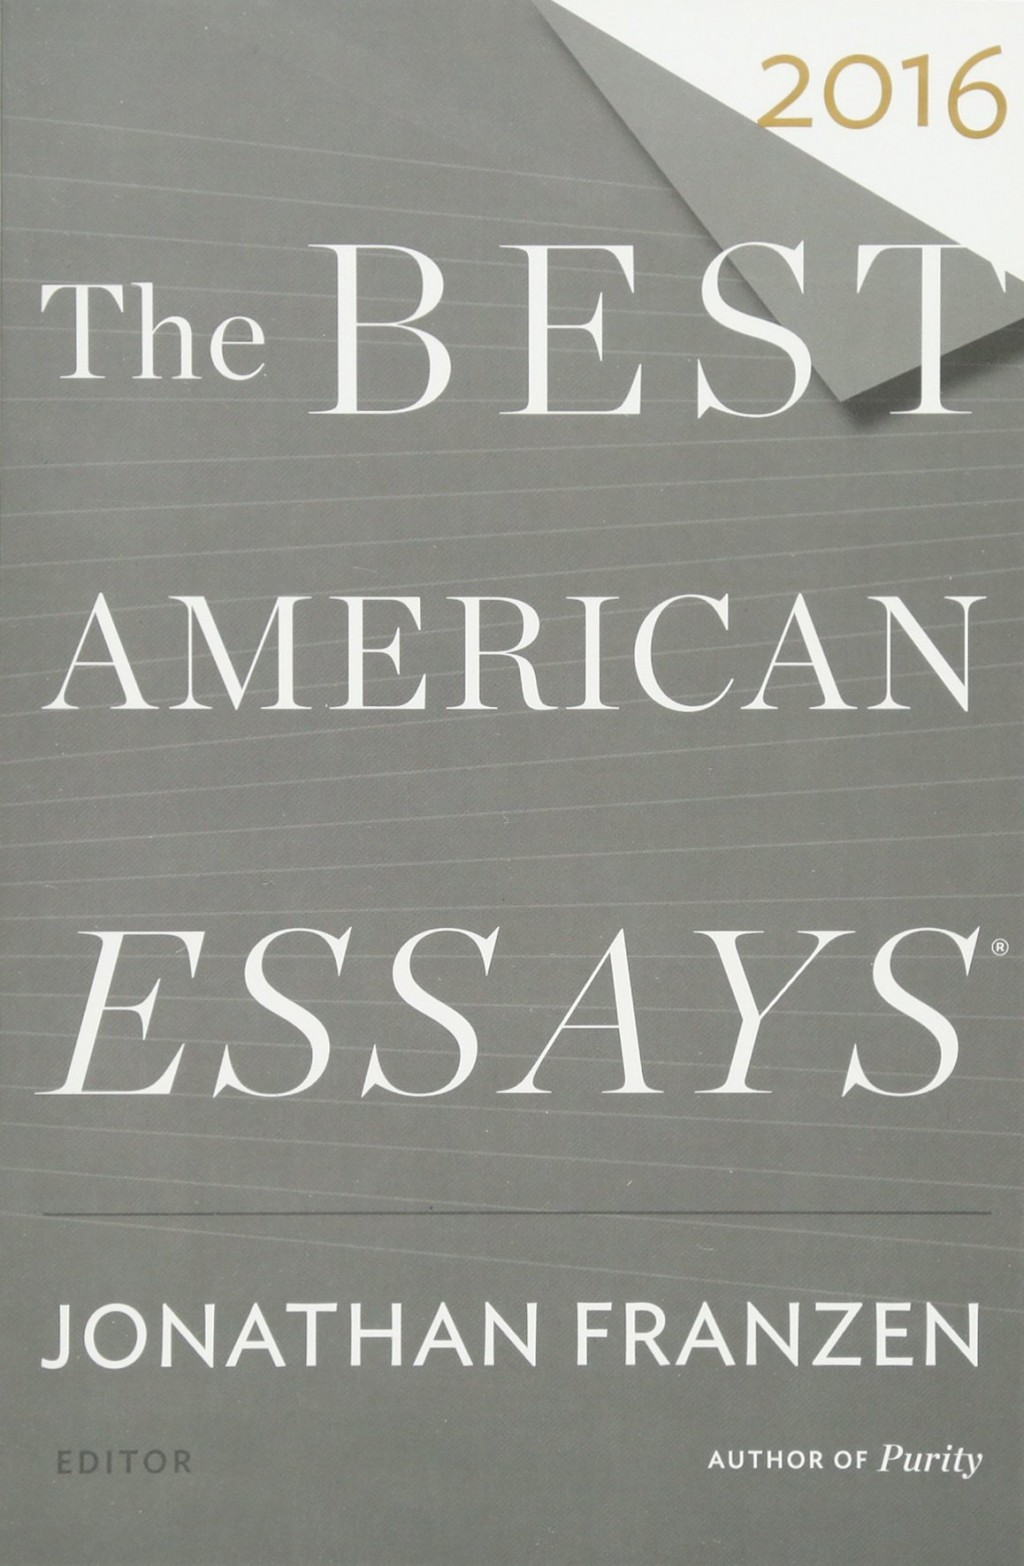 001 71a6bhsgsdl Essay Example Best Essays Breathtaking 2016 The American Audiobook Short Pdf Large